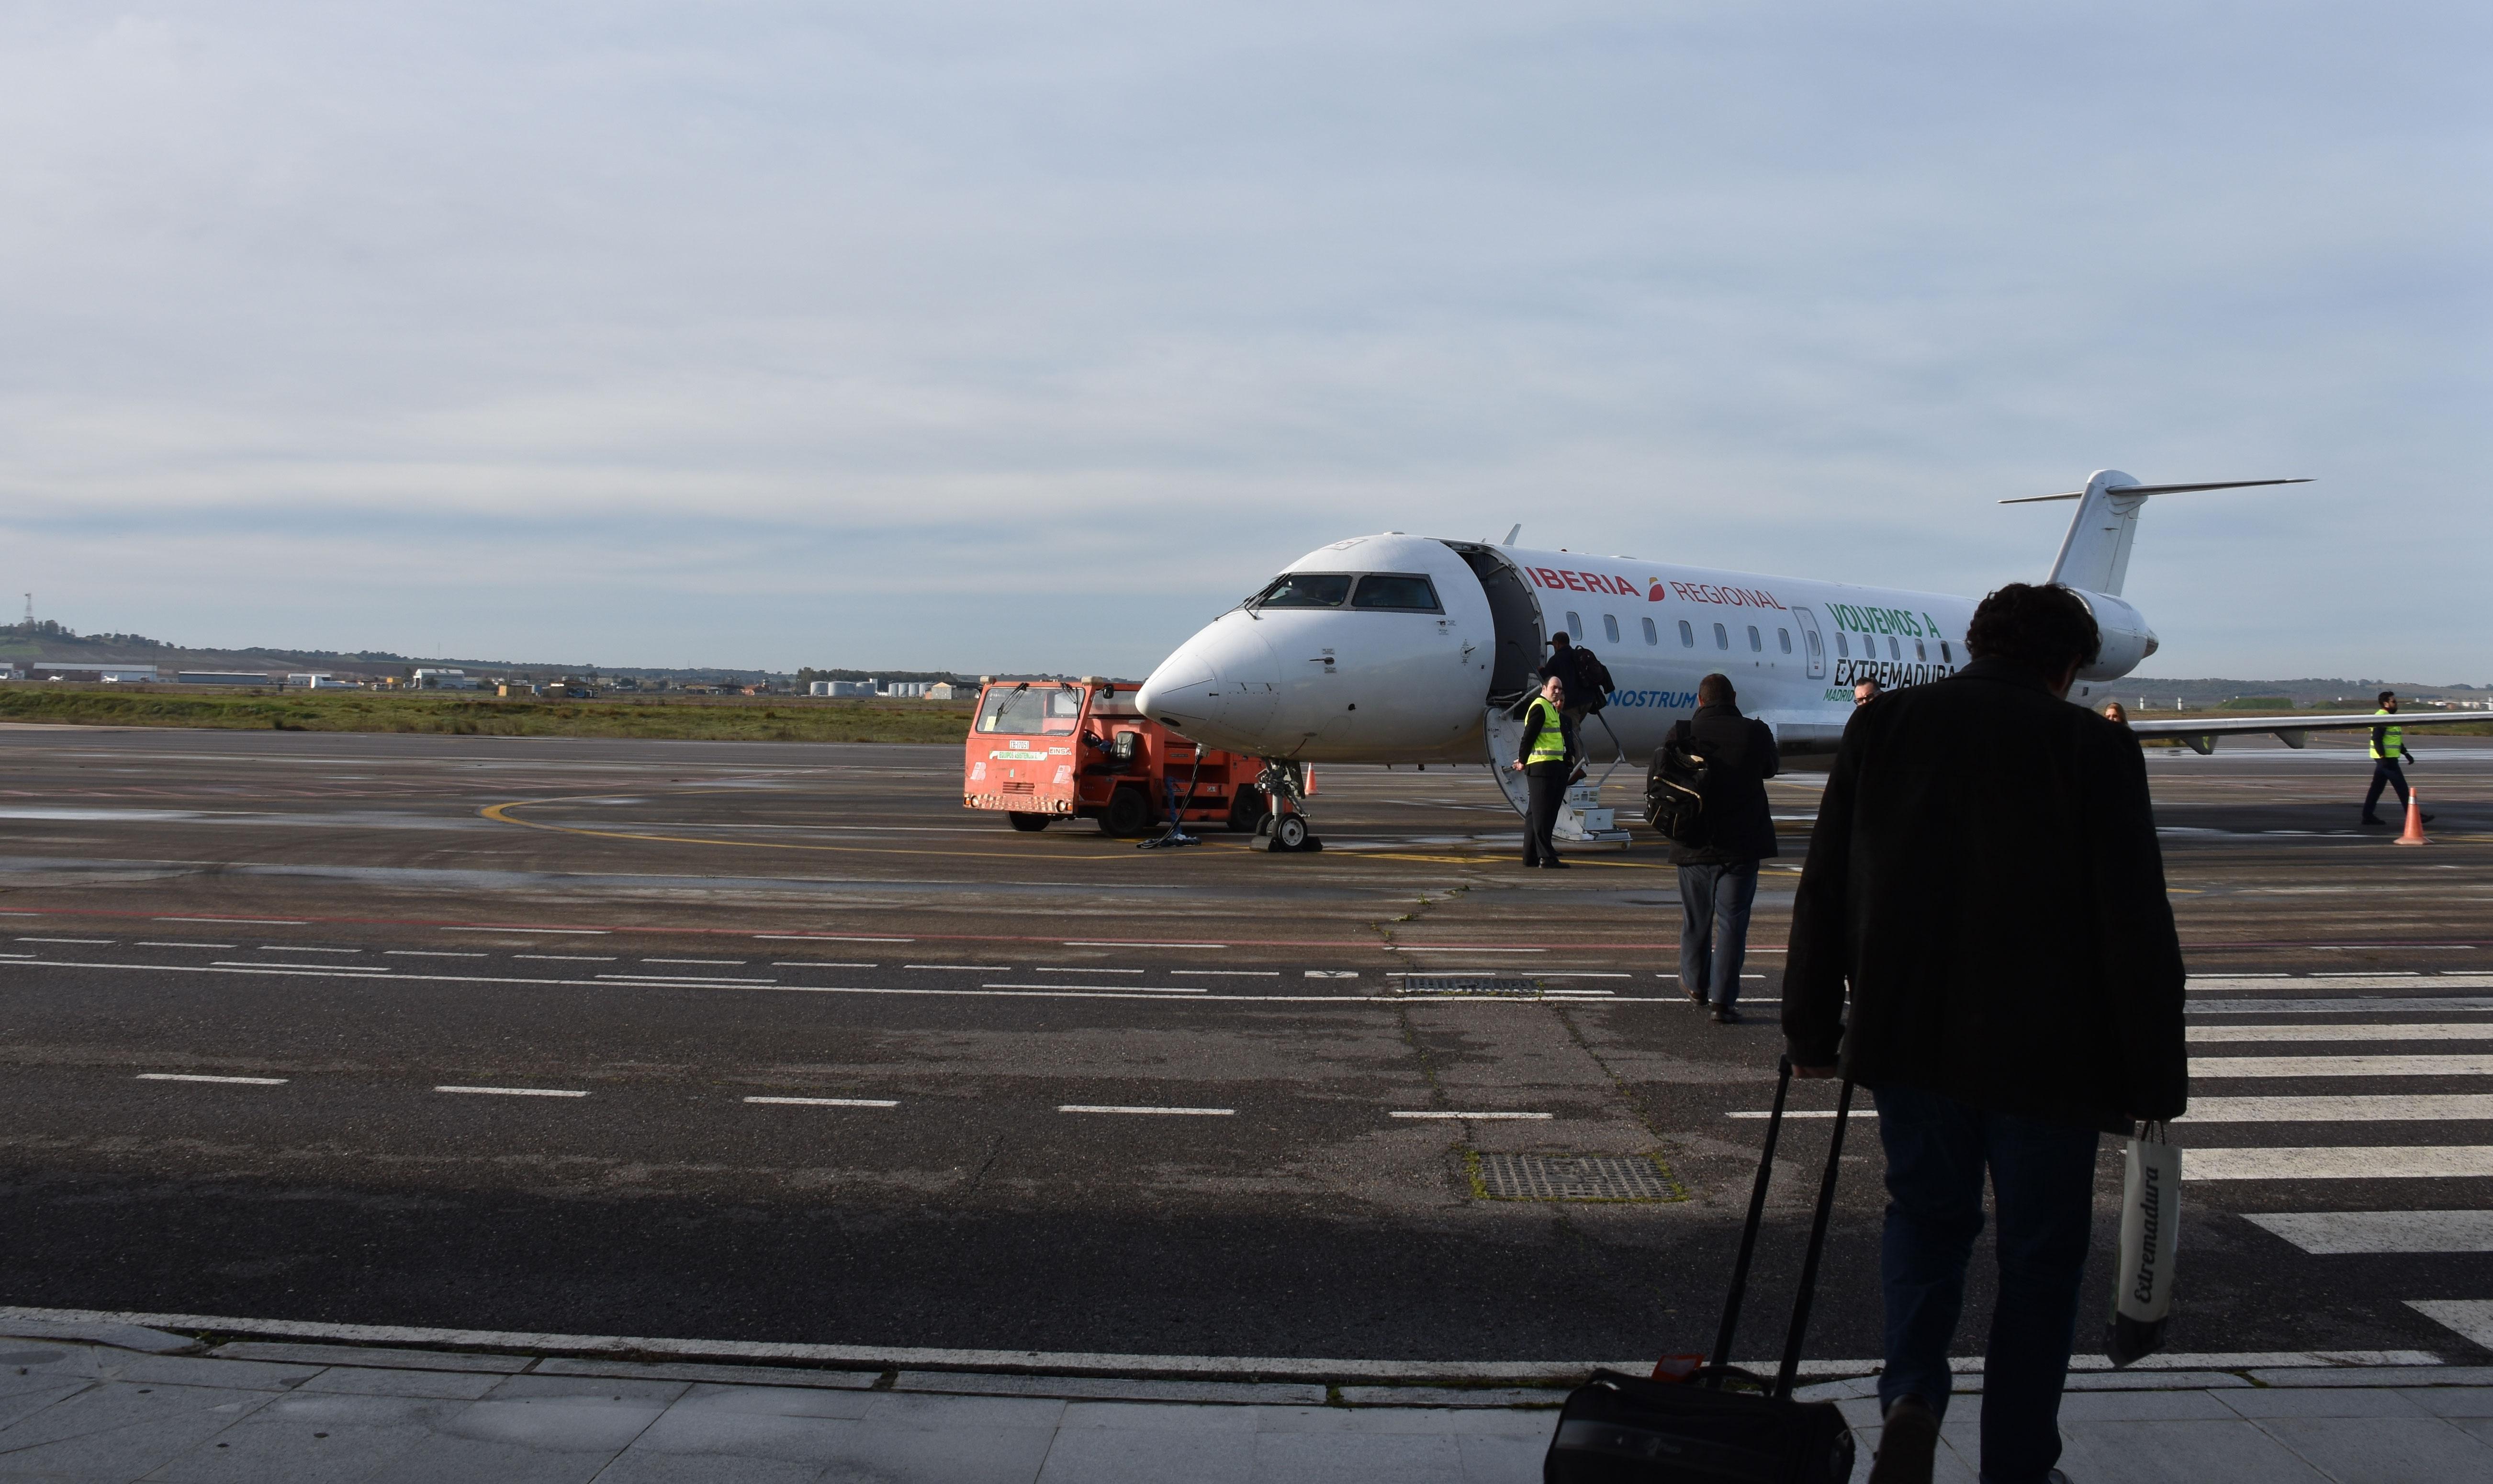 aeroportoBadajoz